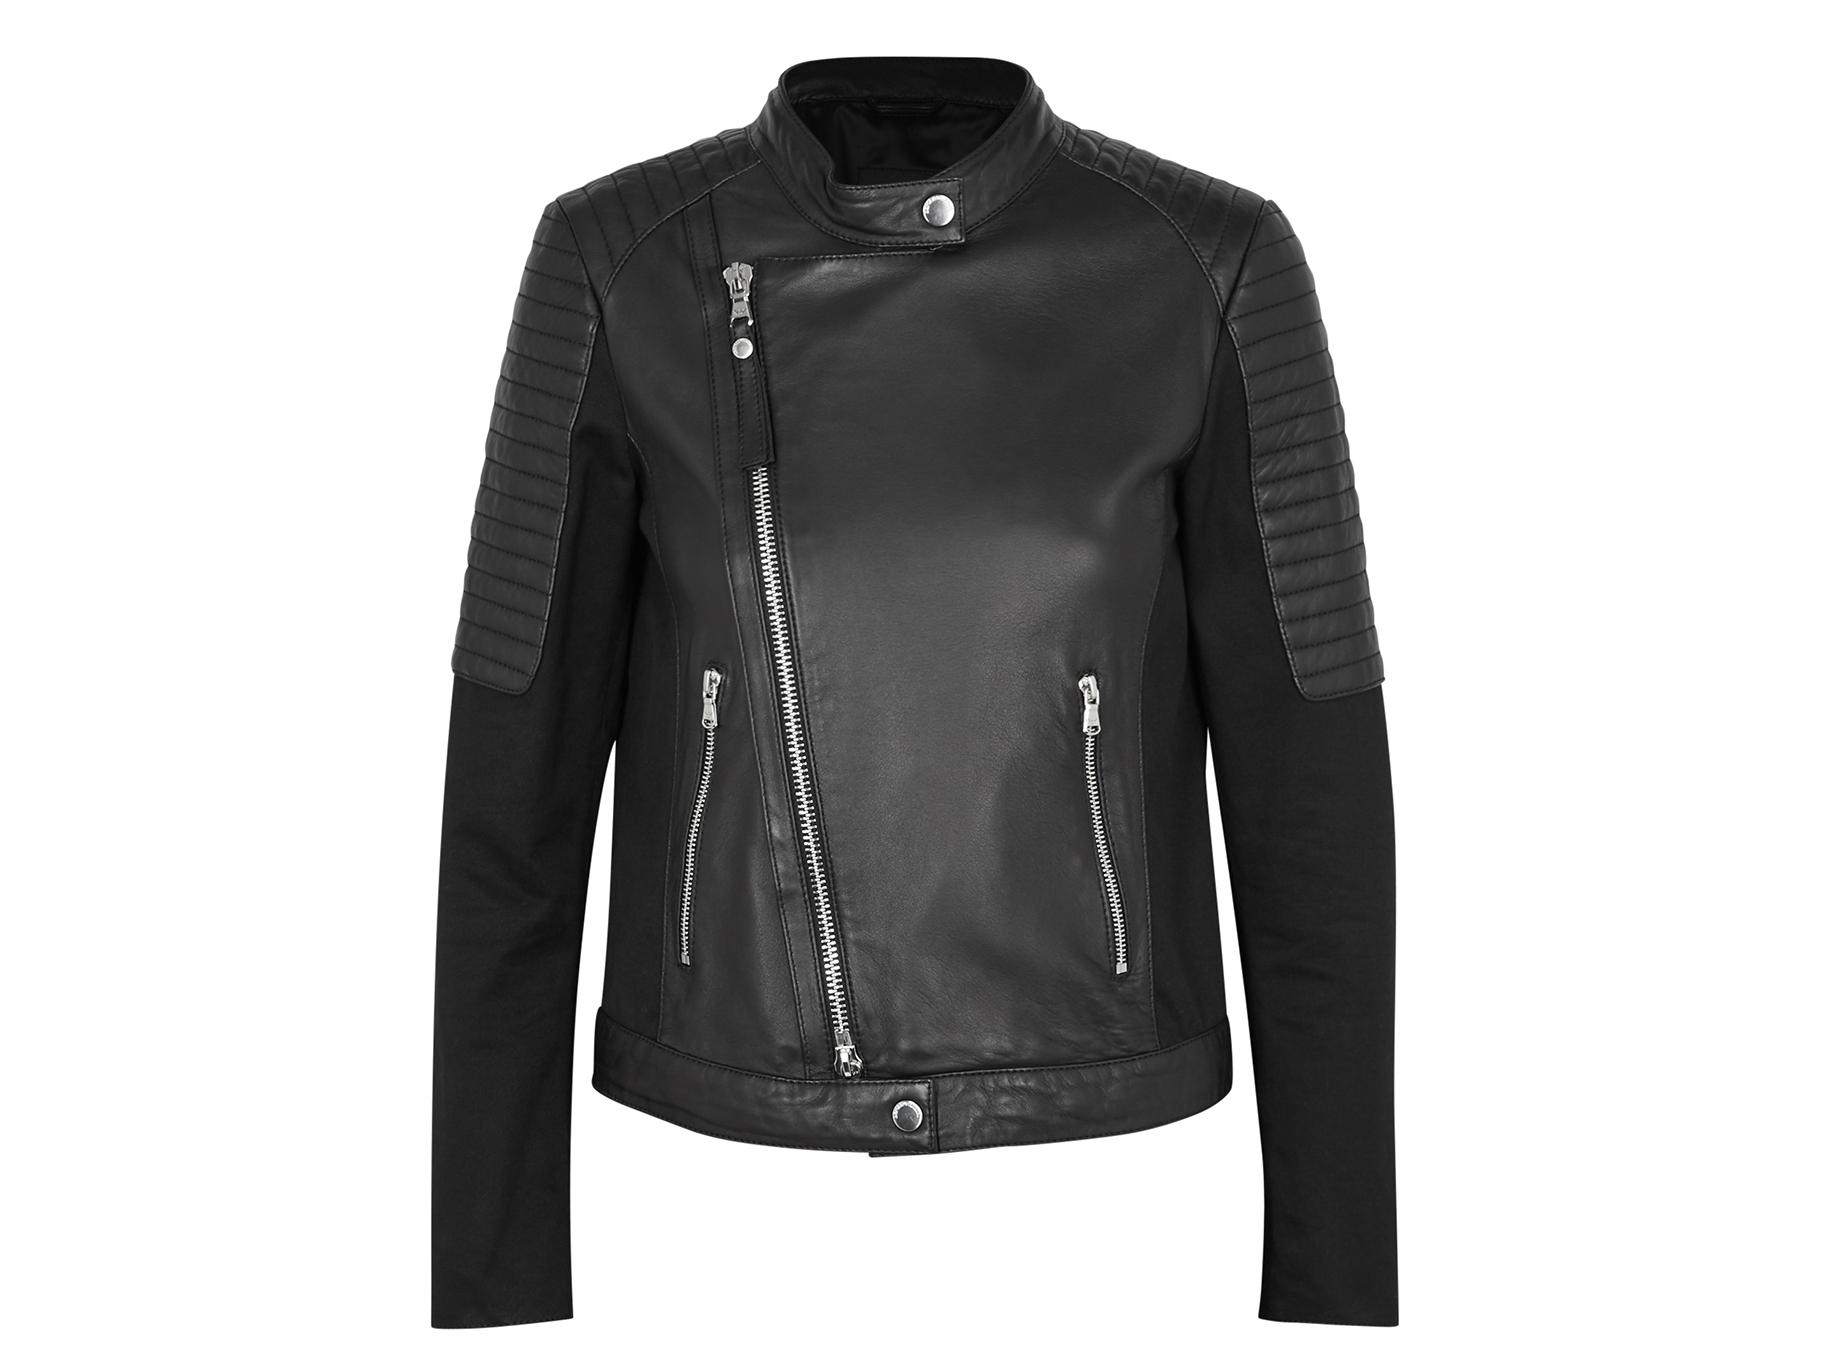 7704c6bfabb Emporio Armani Black leather biker jacket - Harvey Nichols